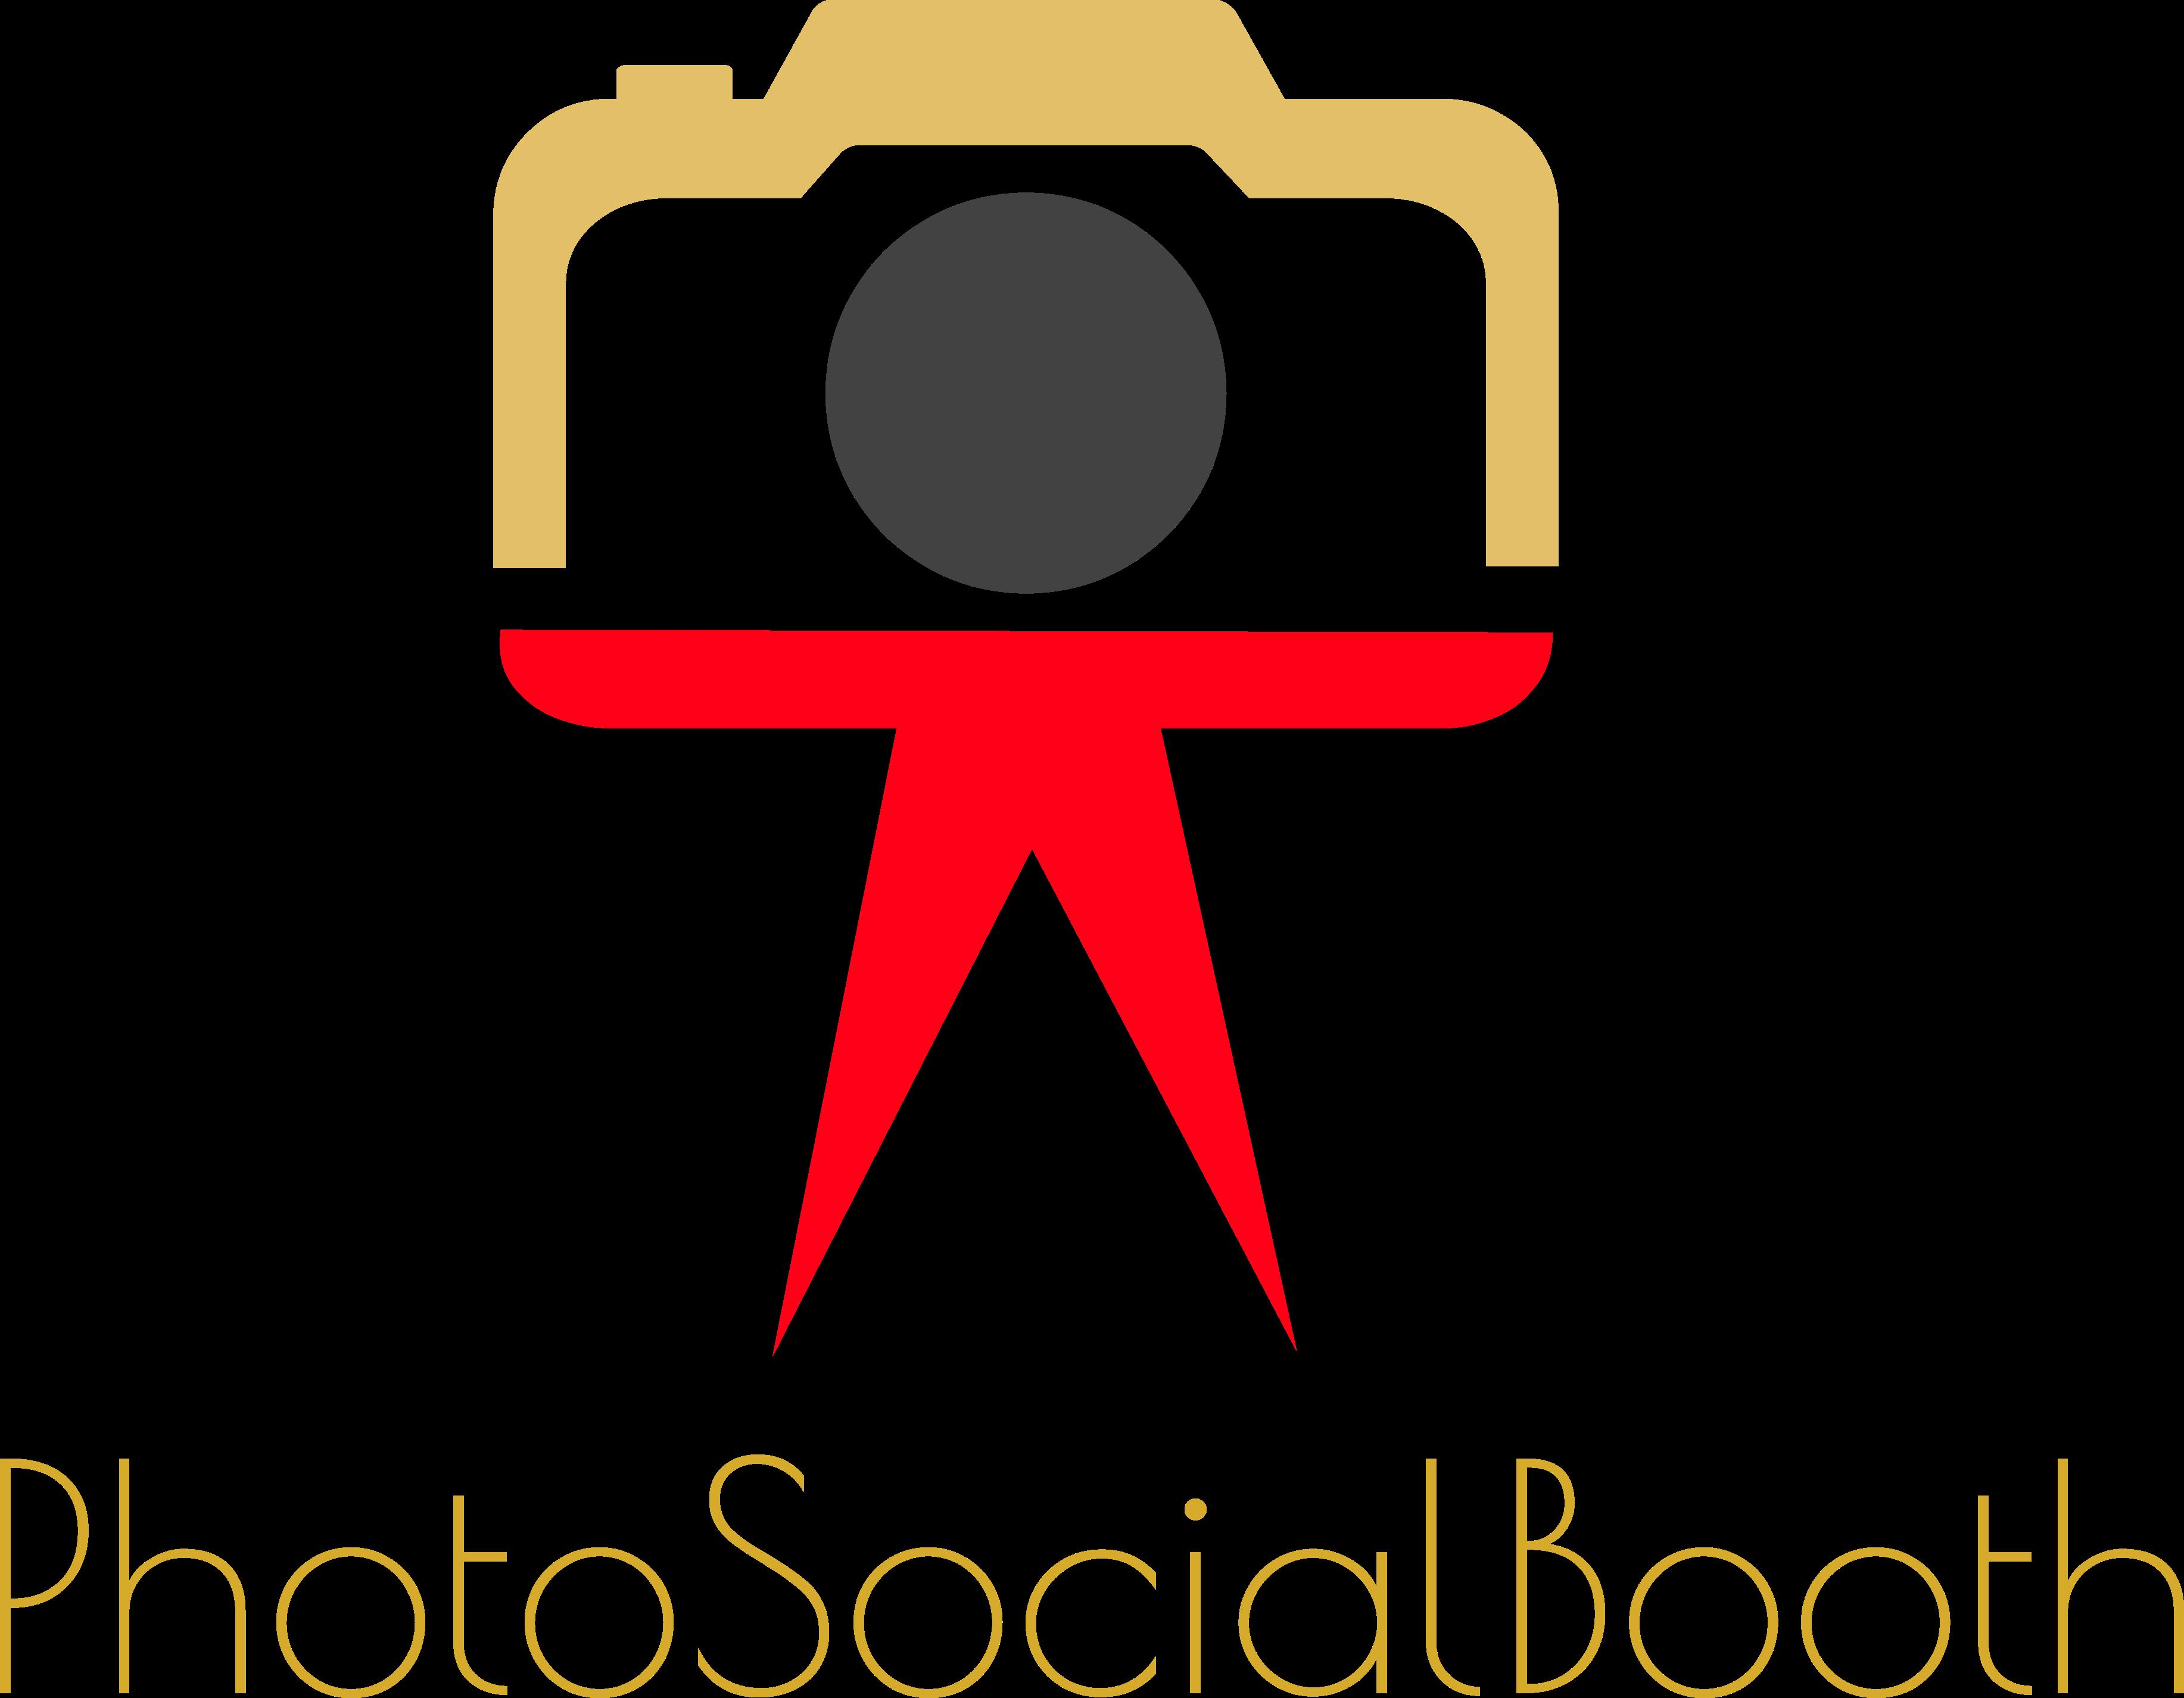 PhotoSocialBooth